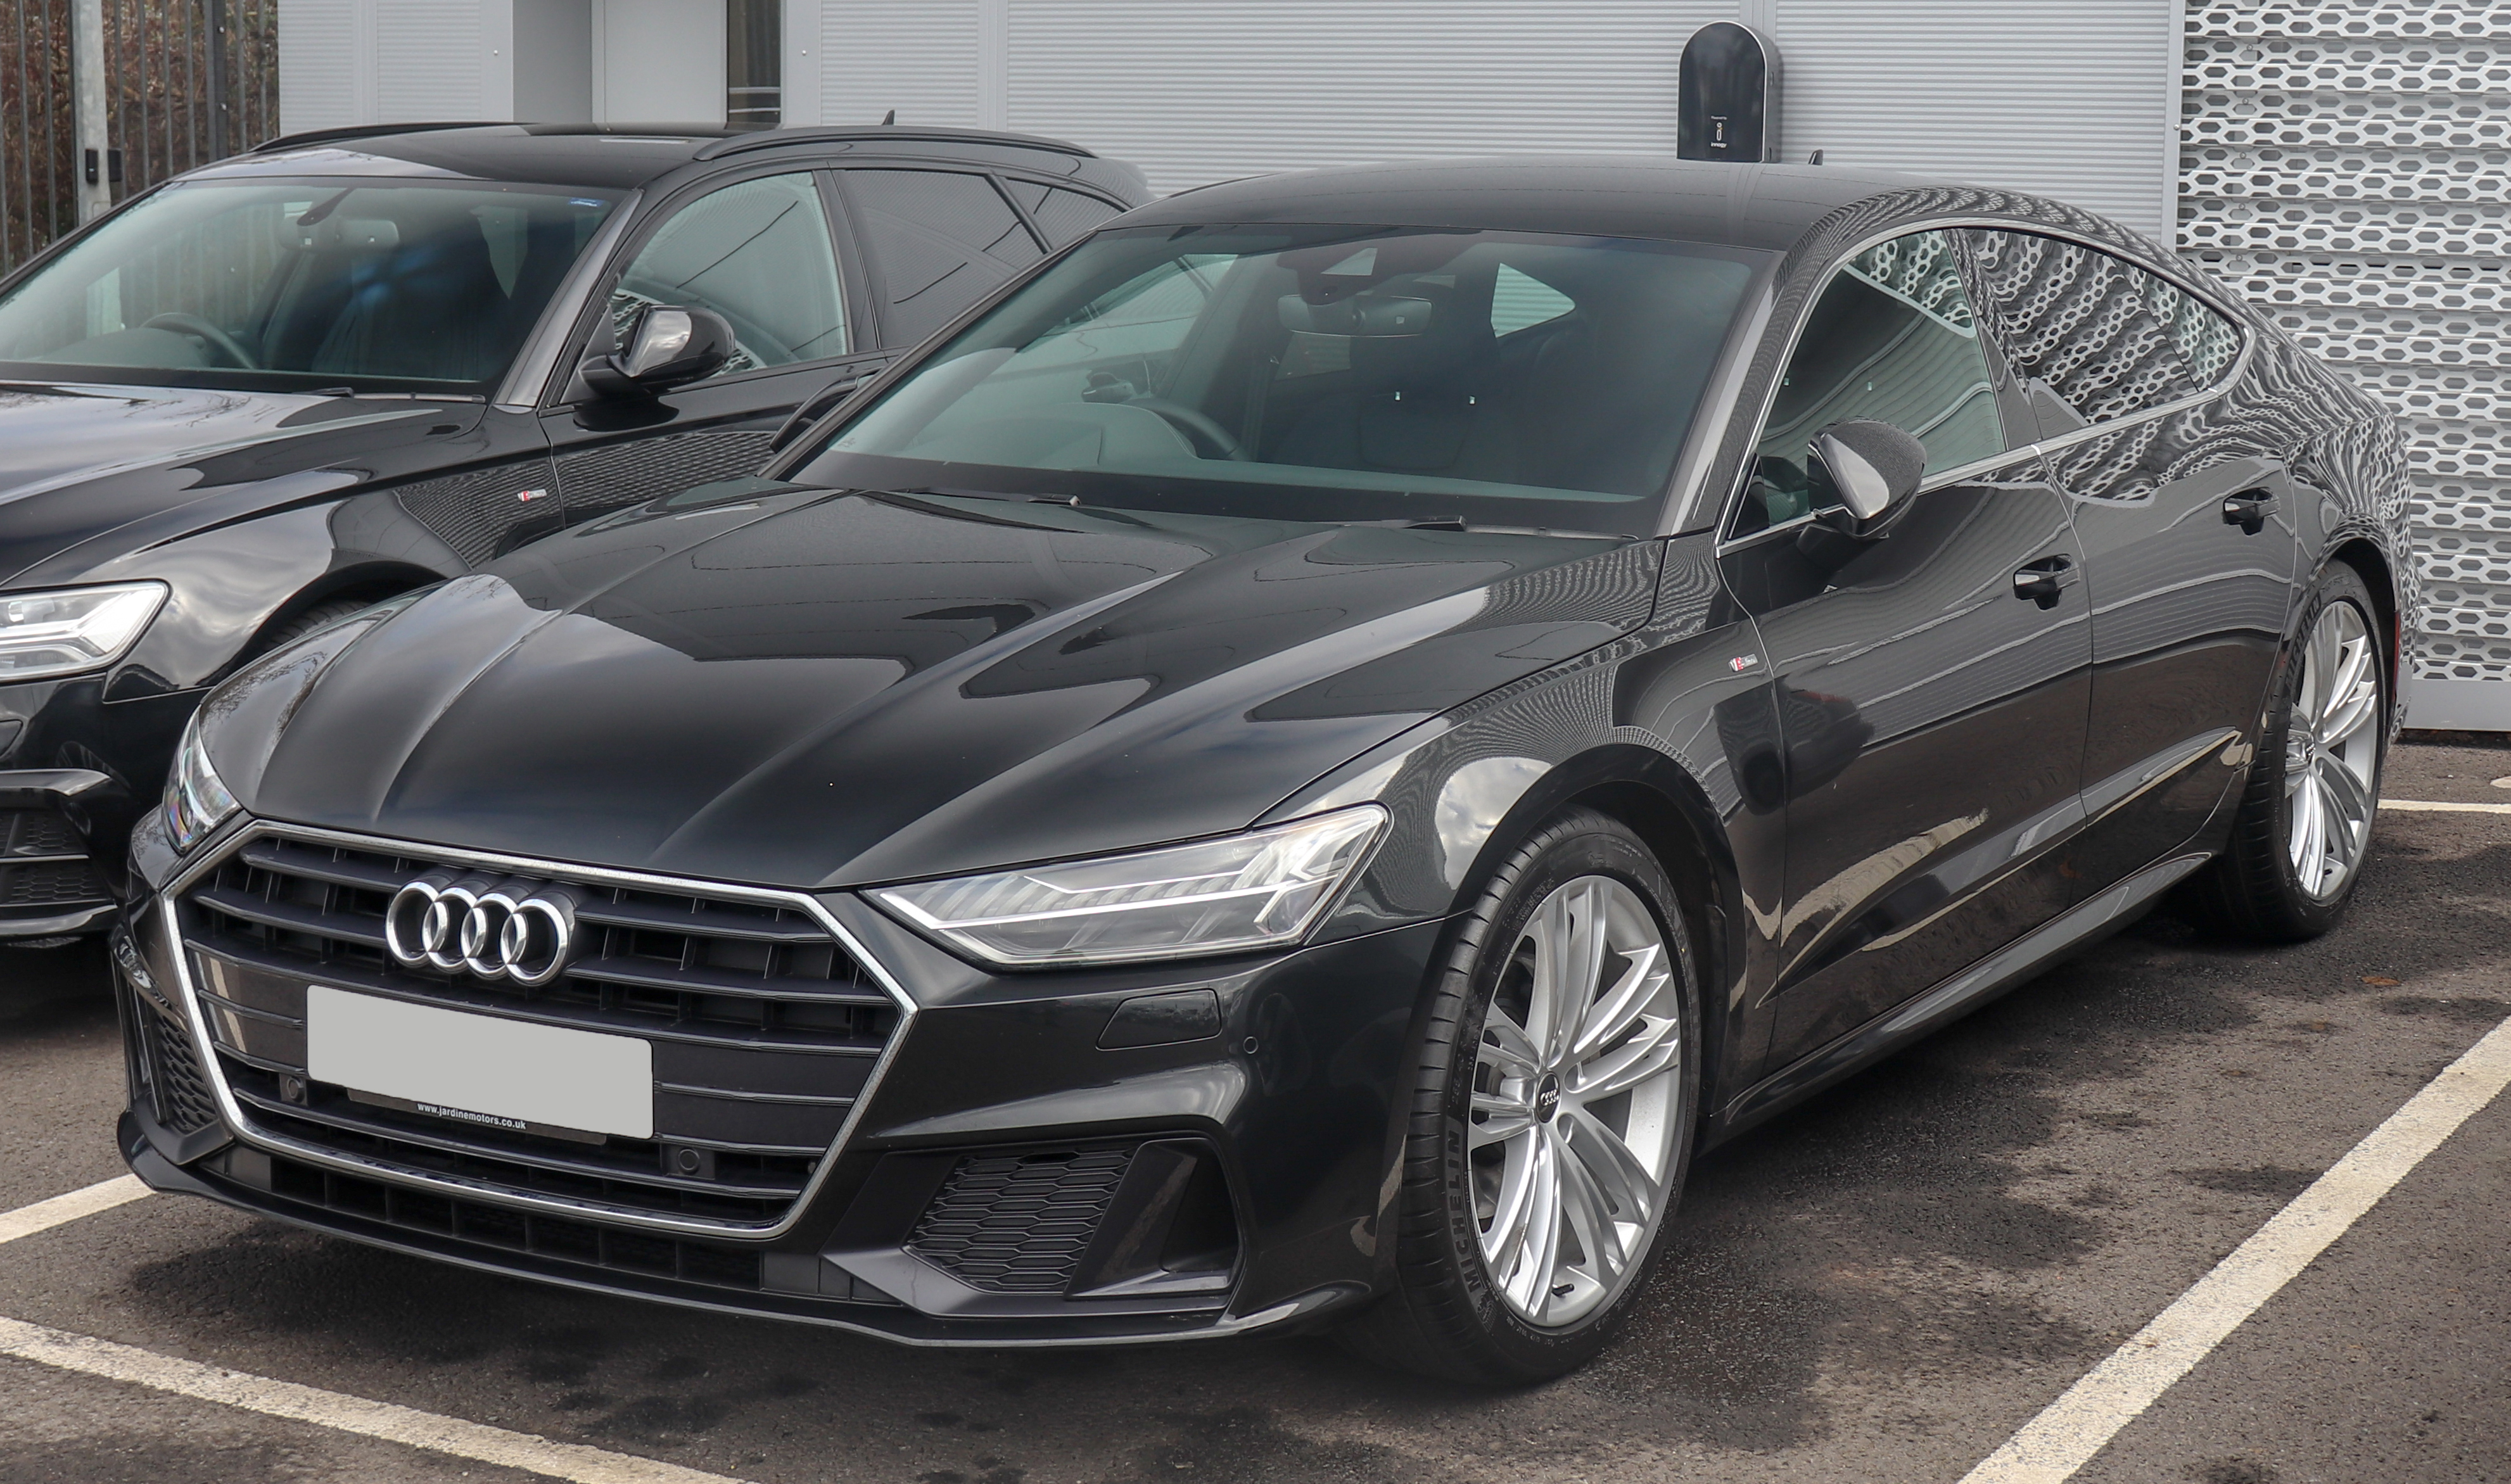 Kelebihan A7 Audi 2019 Murah Berkualitas